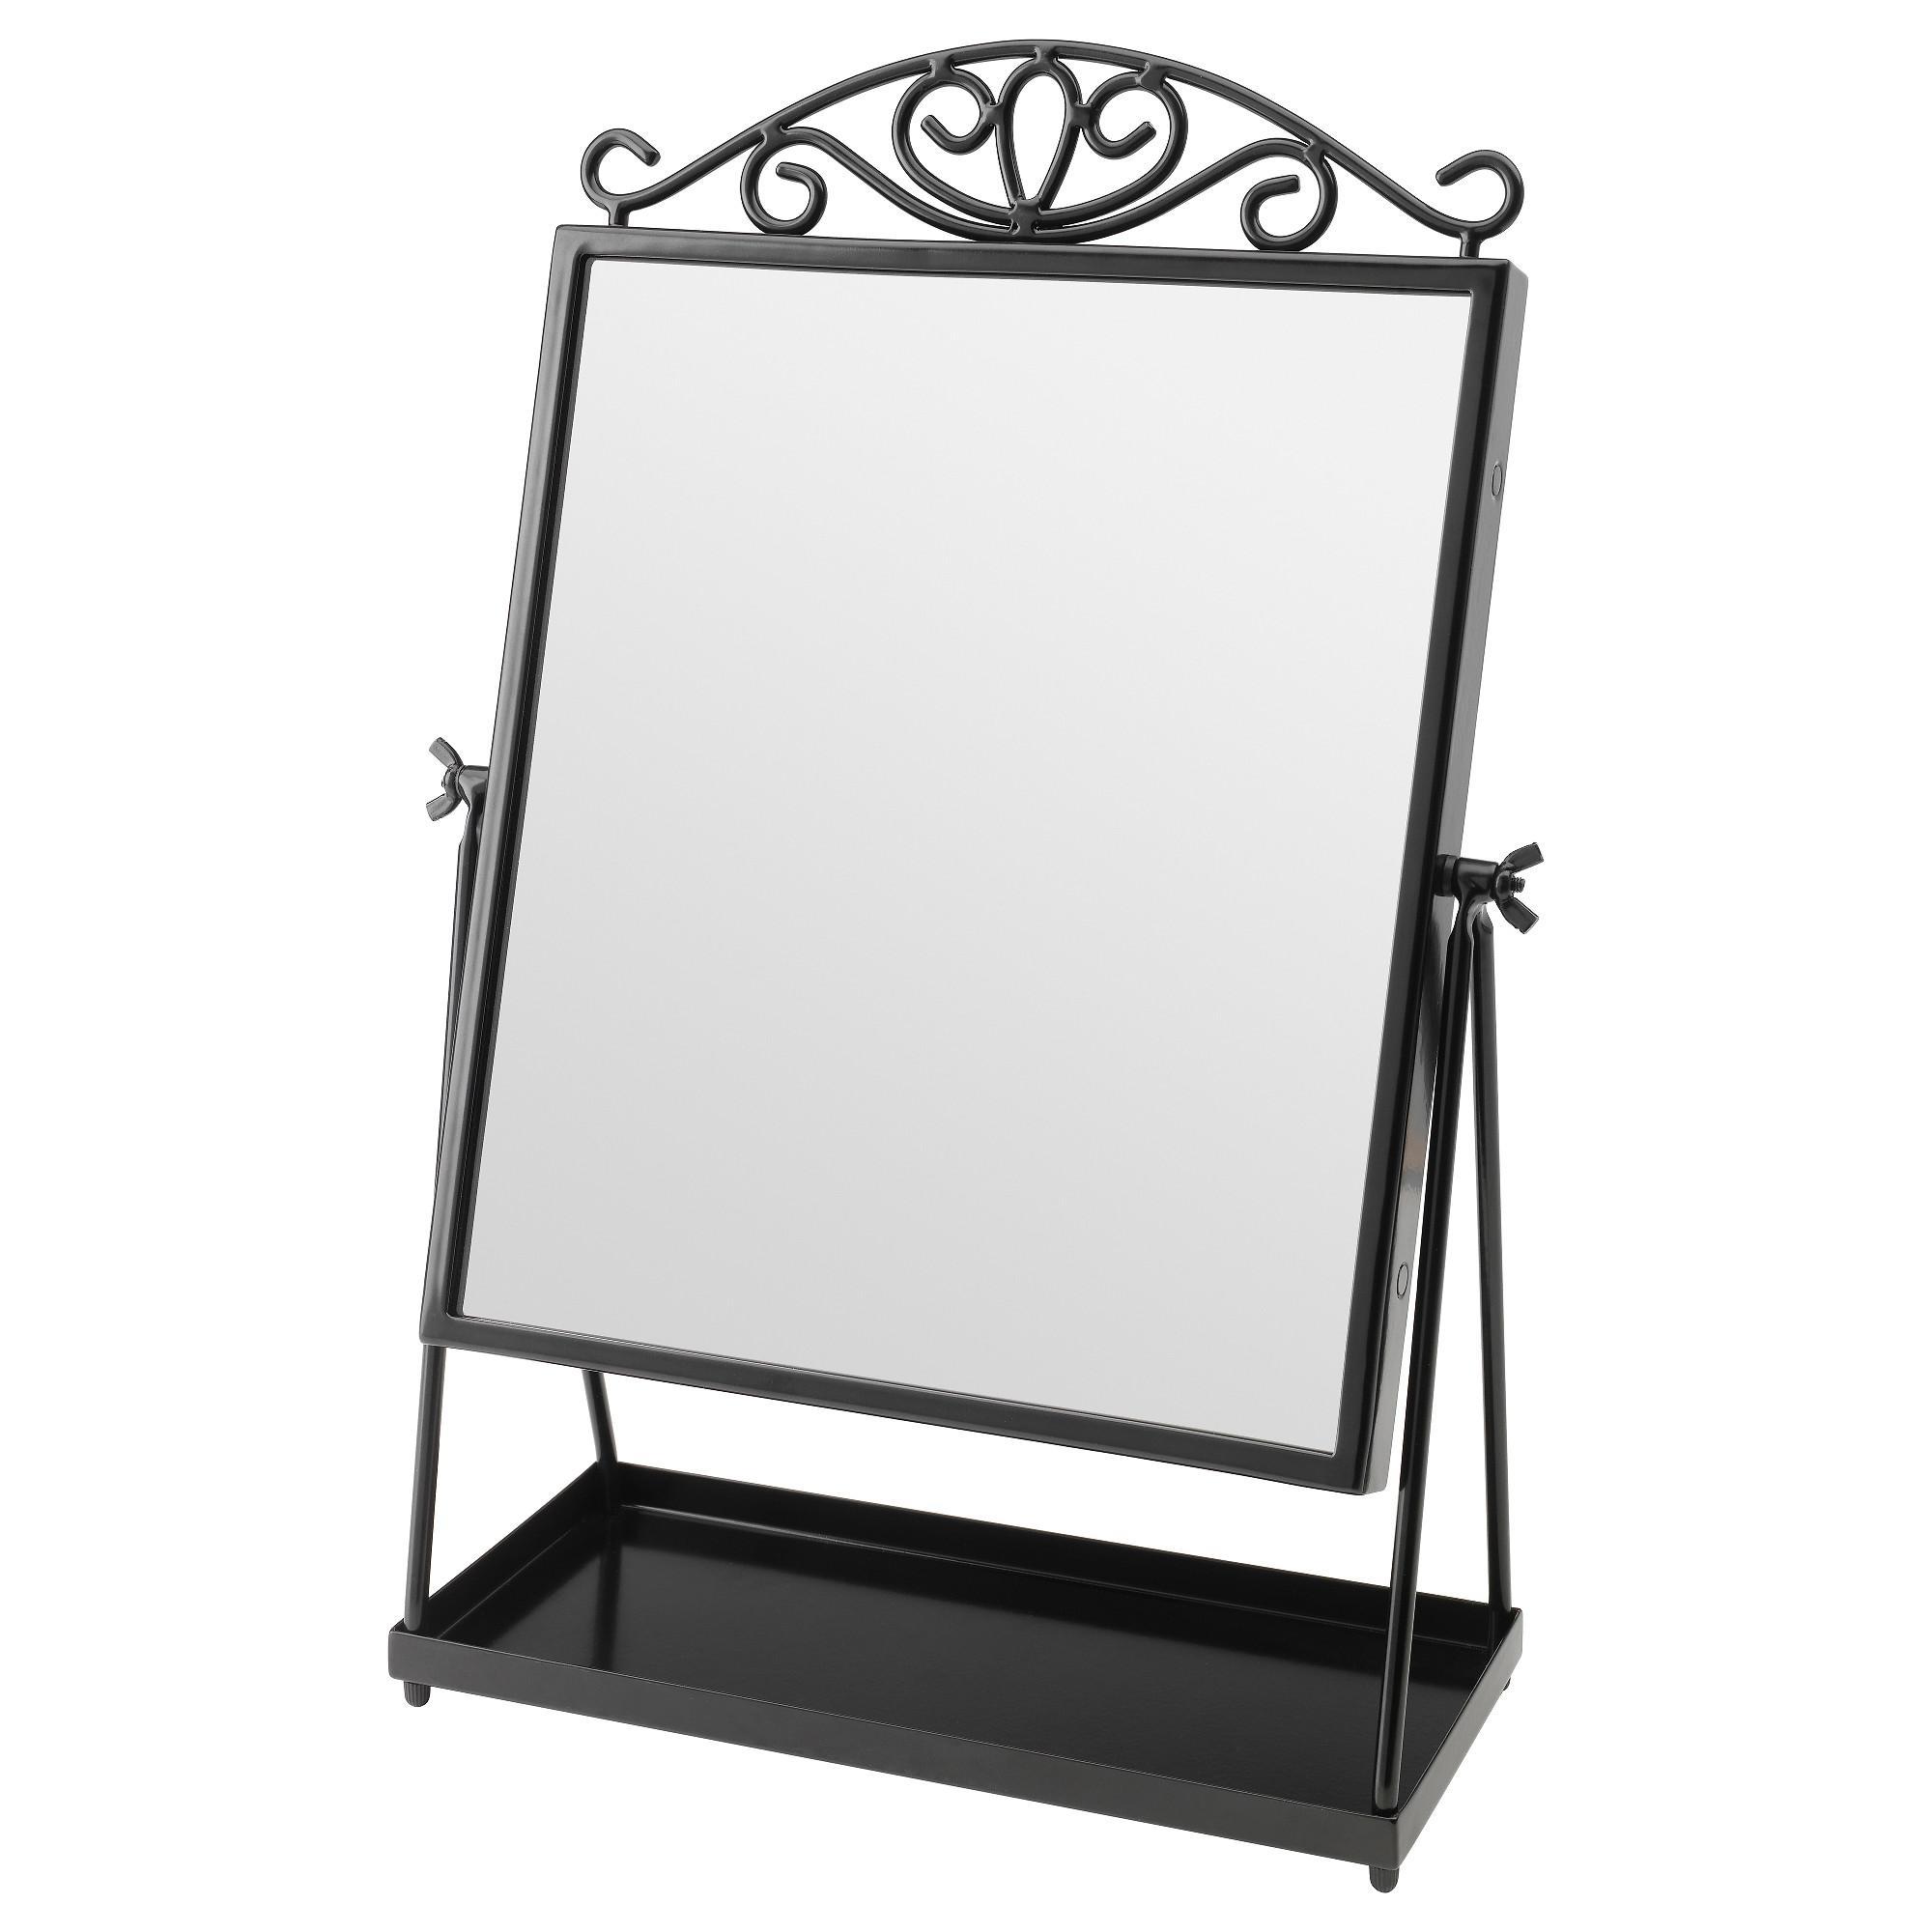 Karmsund Table Mirror Black 27X43 Cm – Ikea With Regard To Standing Table Mirror (Image 8 of 20)